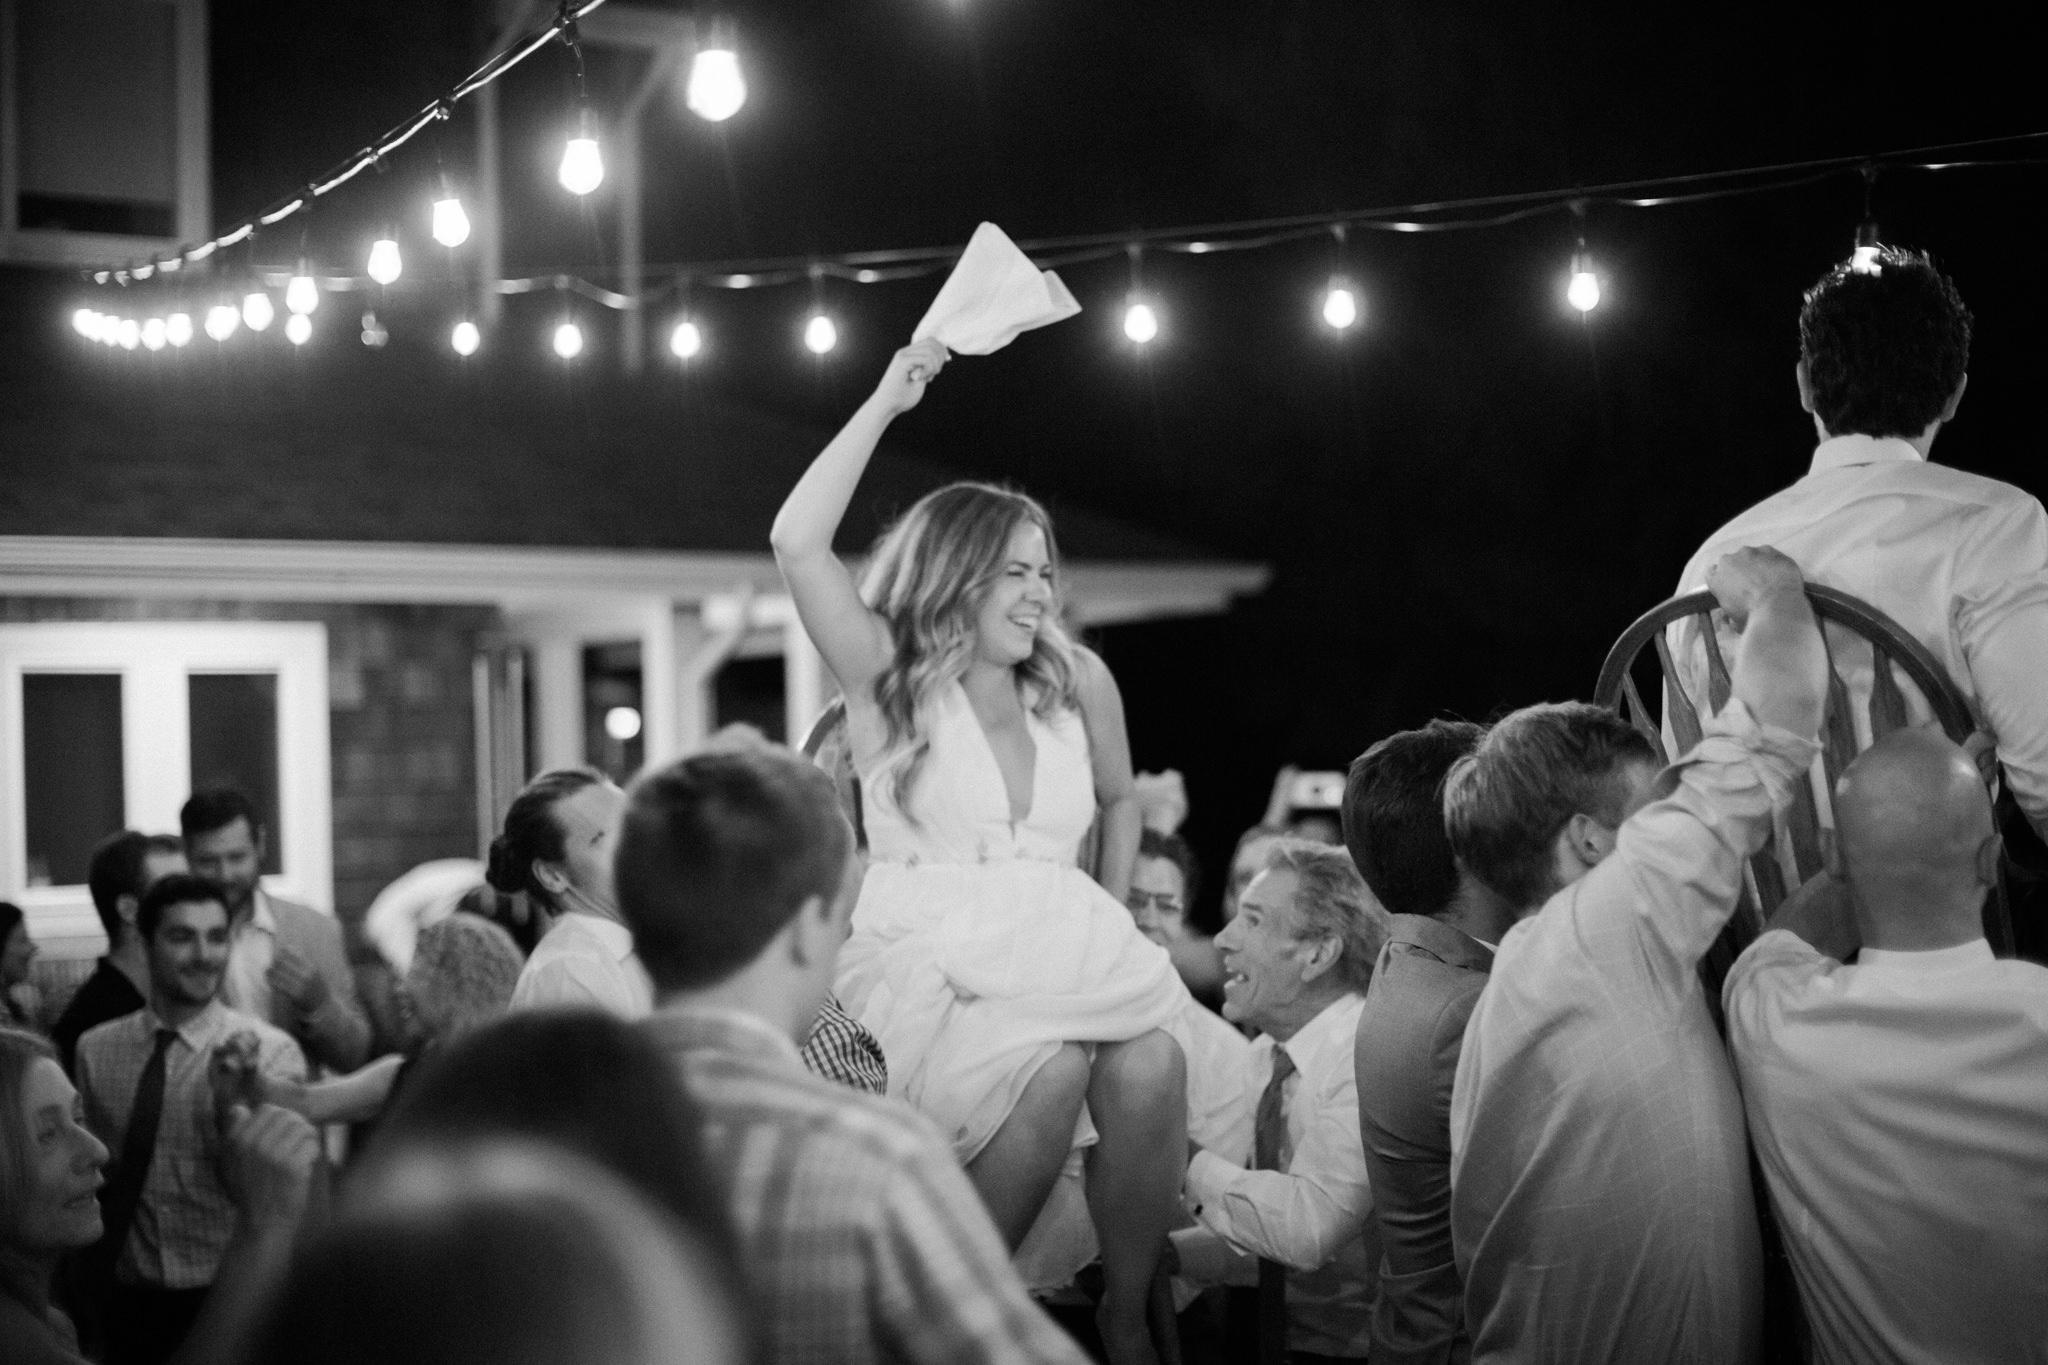 Backyard-Bainbridge-Island-Wedding-Alycia-Lovell-Photography-272.JPG